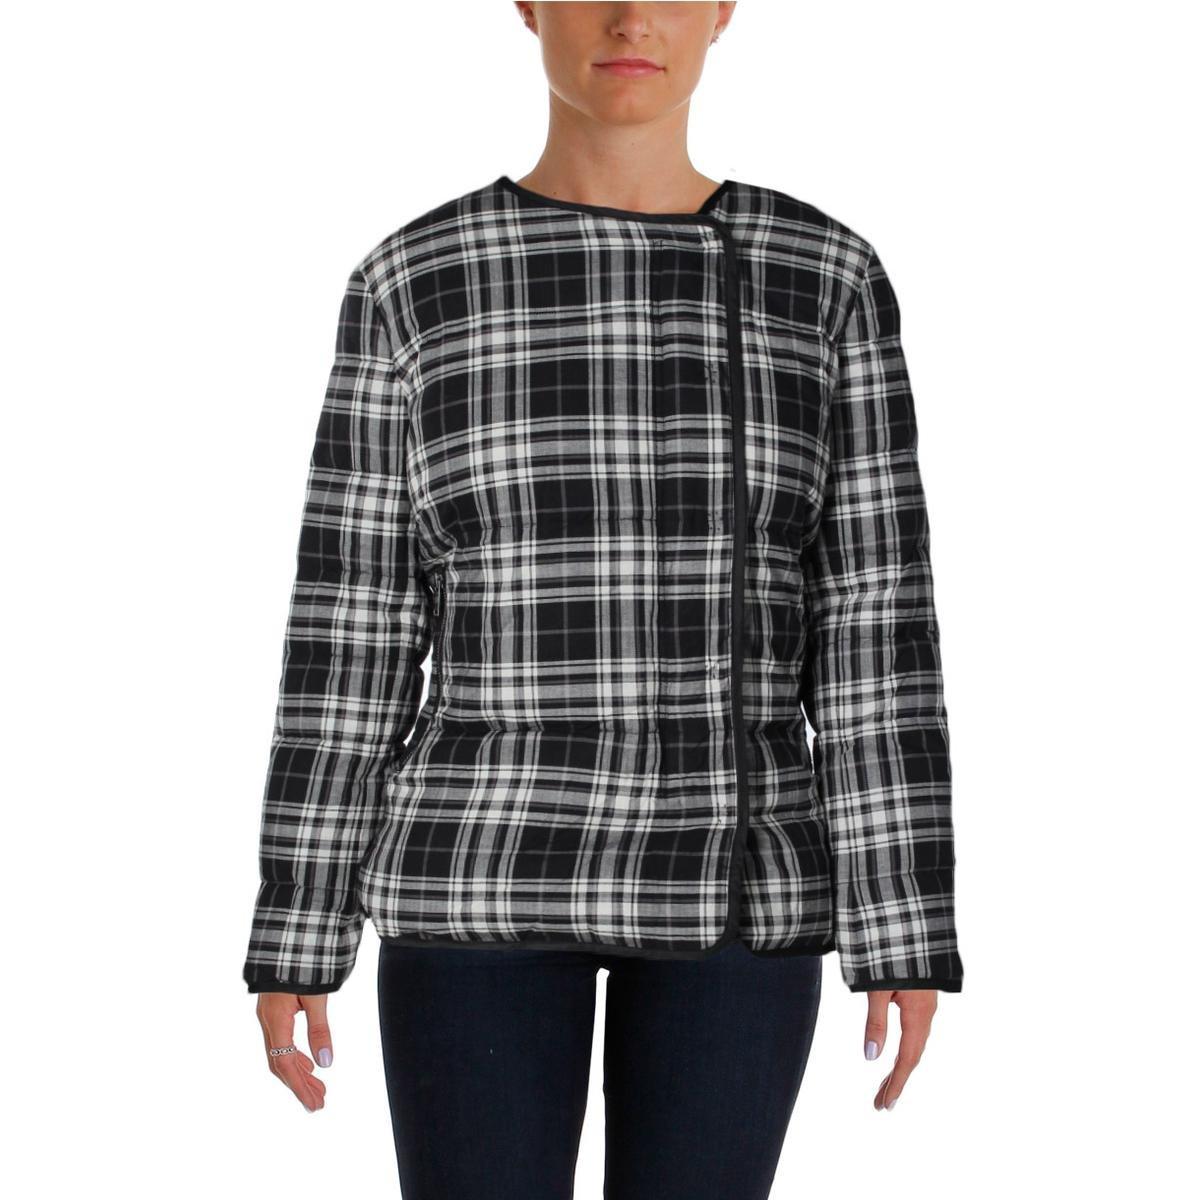 Pure DKNY Womens Reversible Plaid Coat Black S